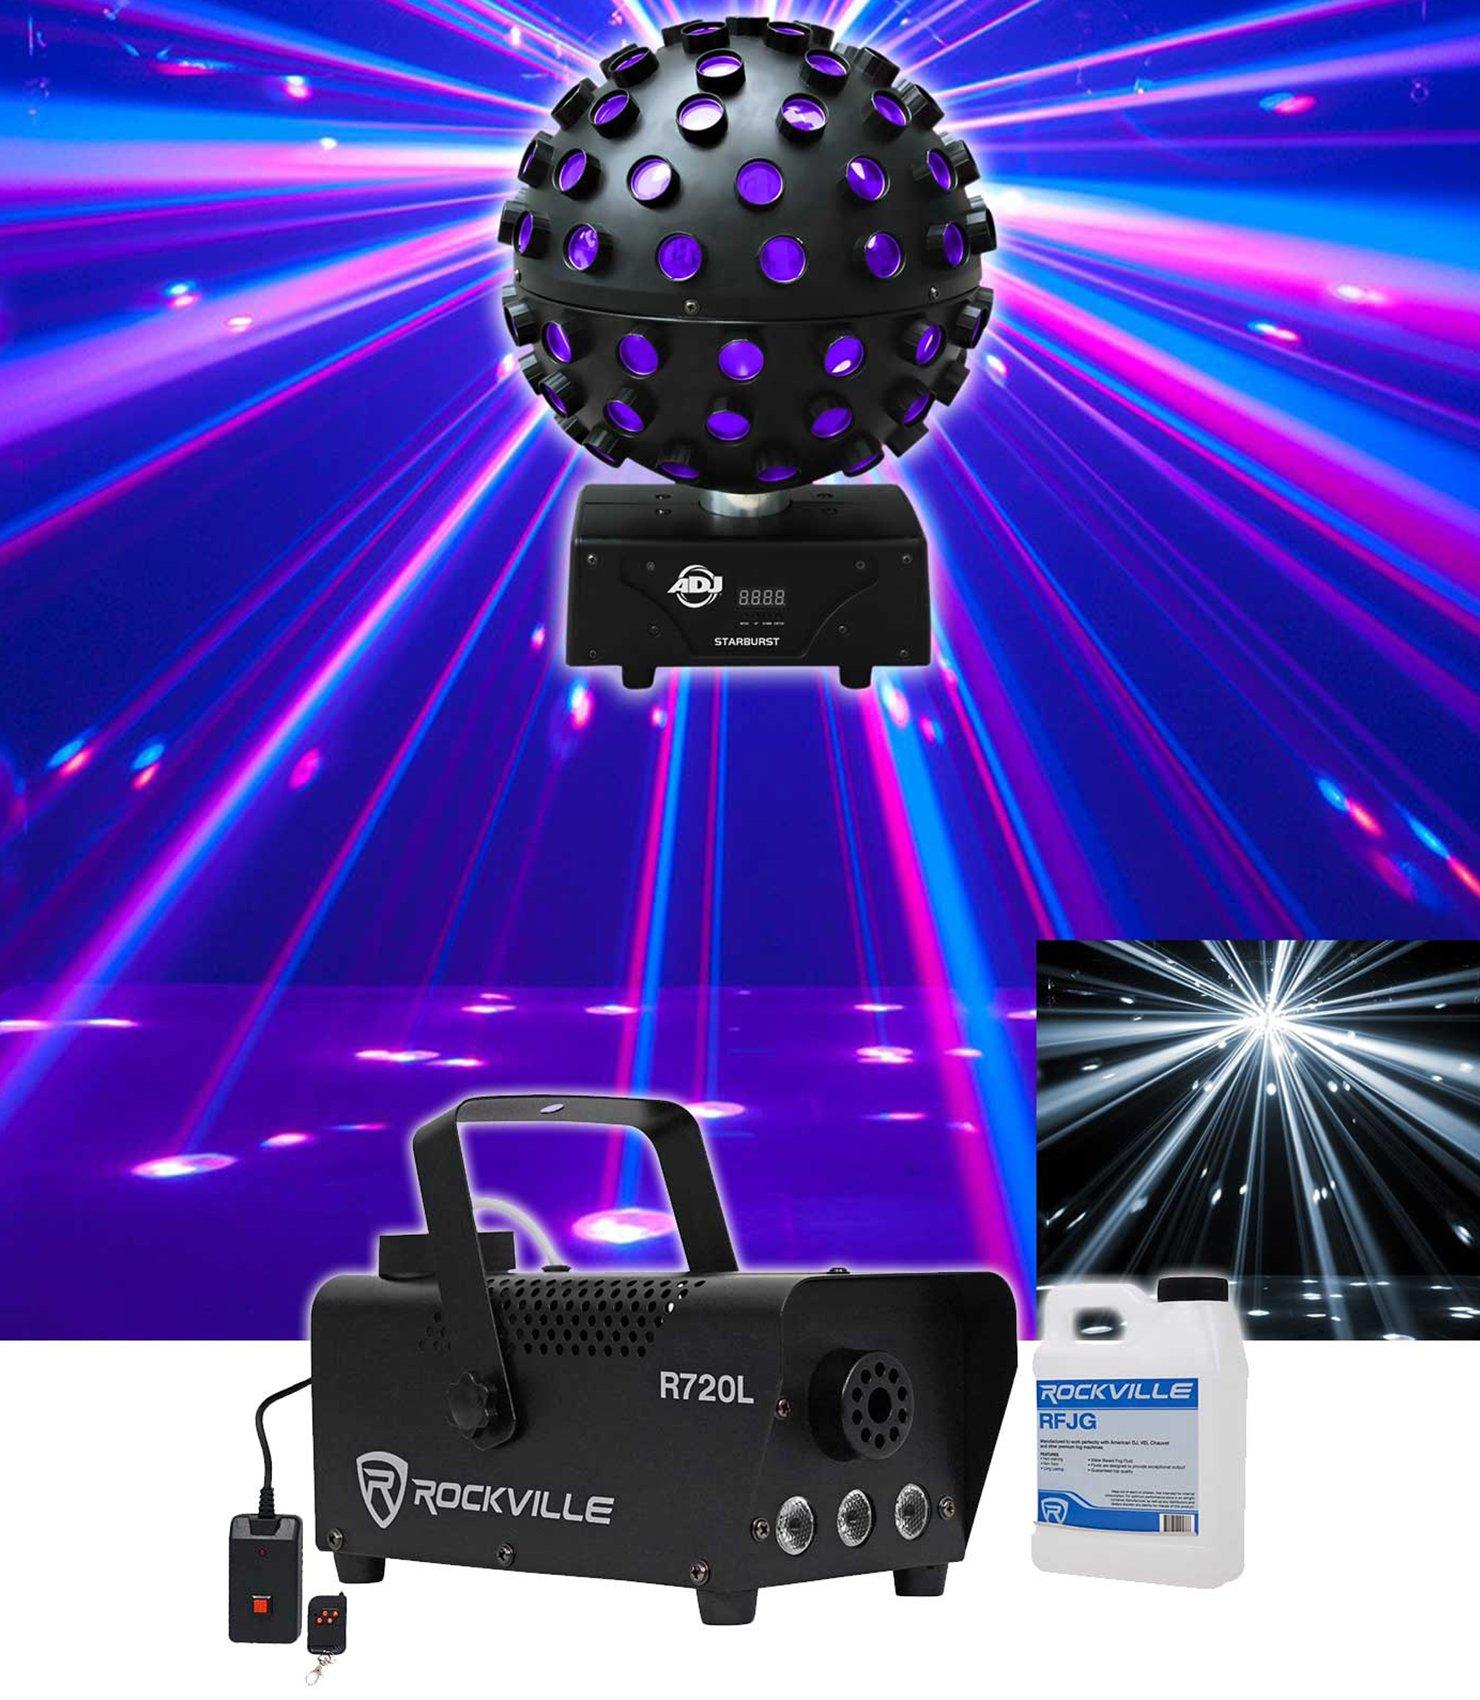 American DJ ADJ Starburst LED Sphere Shooting Beam Lighting Effect+Fog Machine